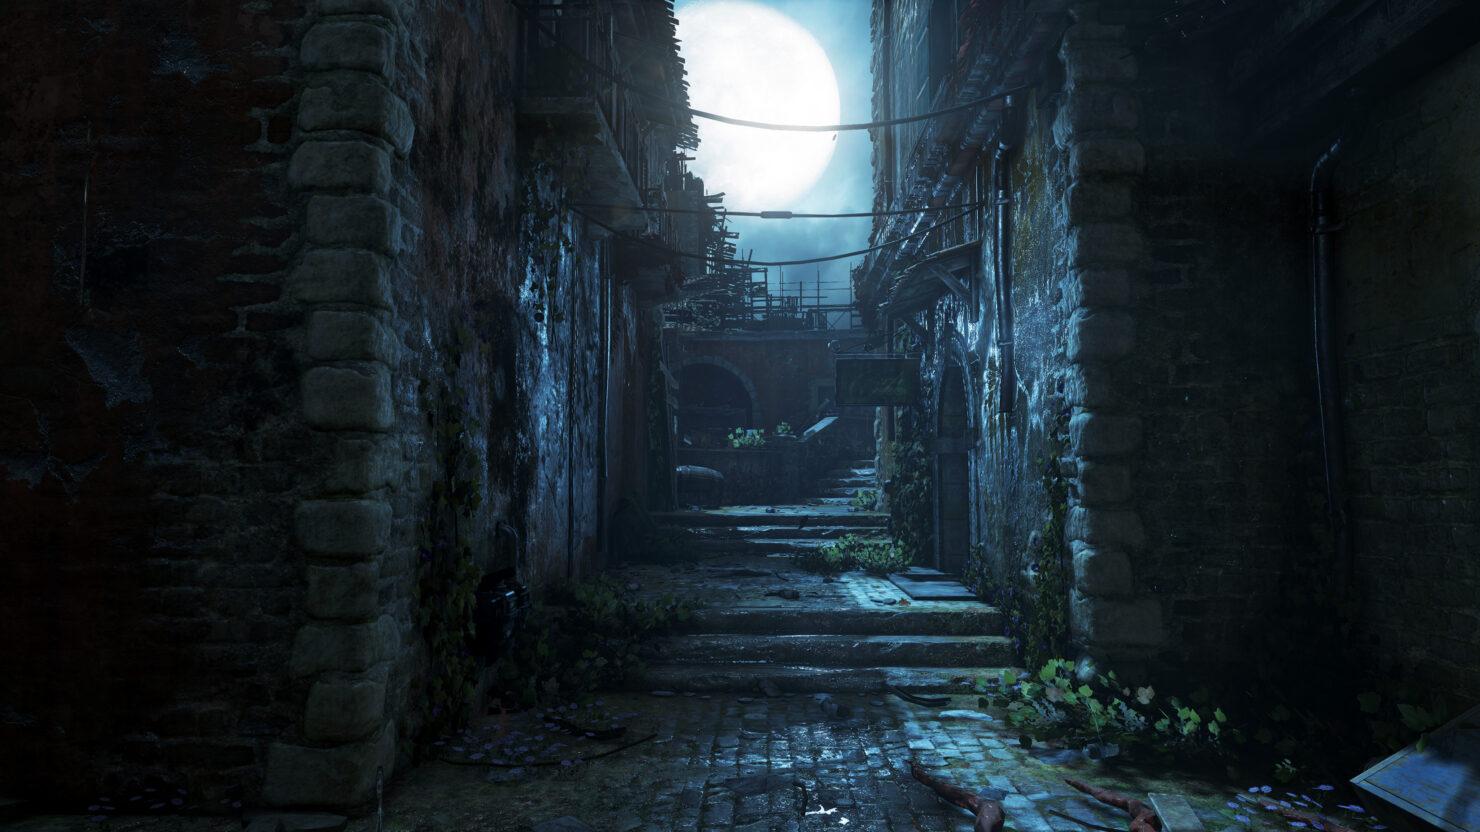 alley-environment